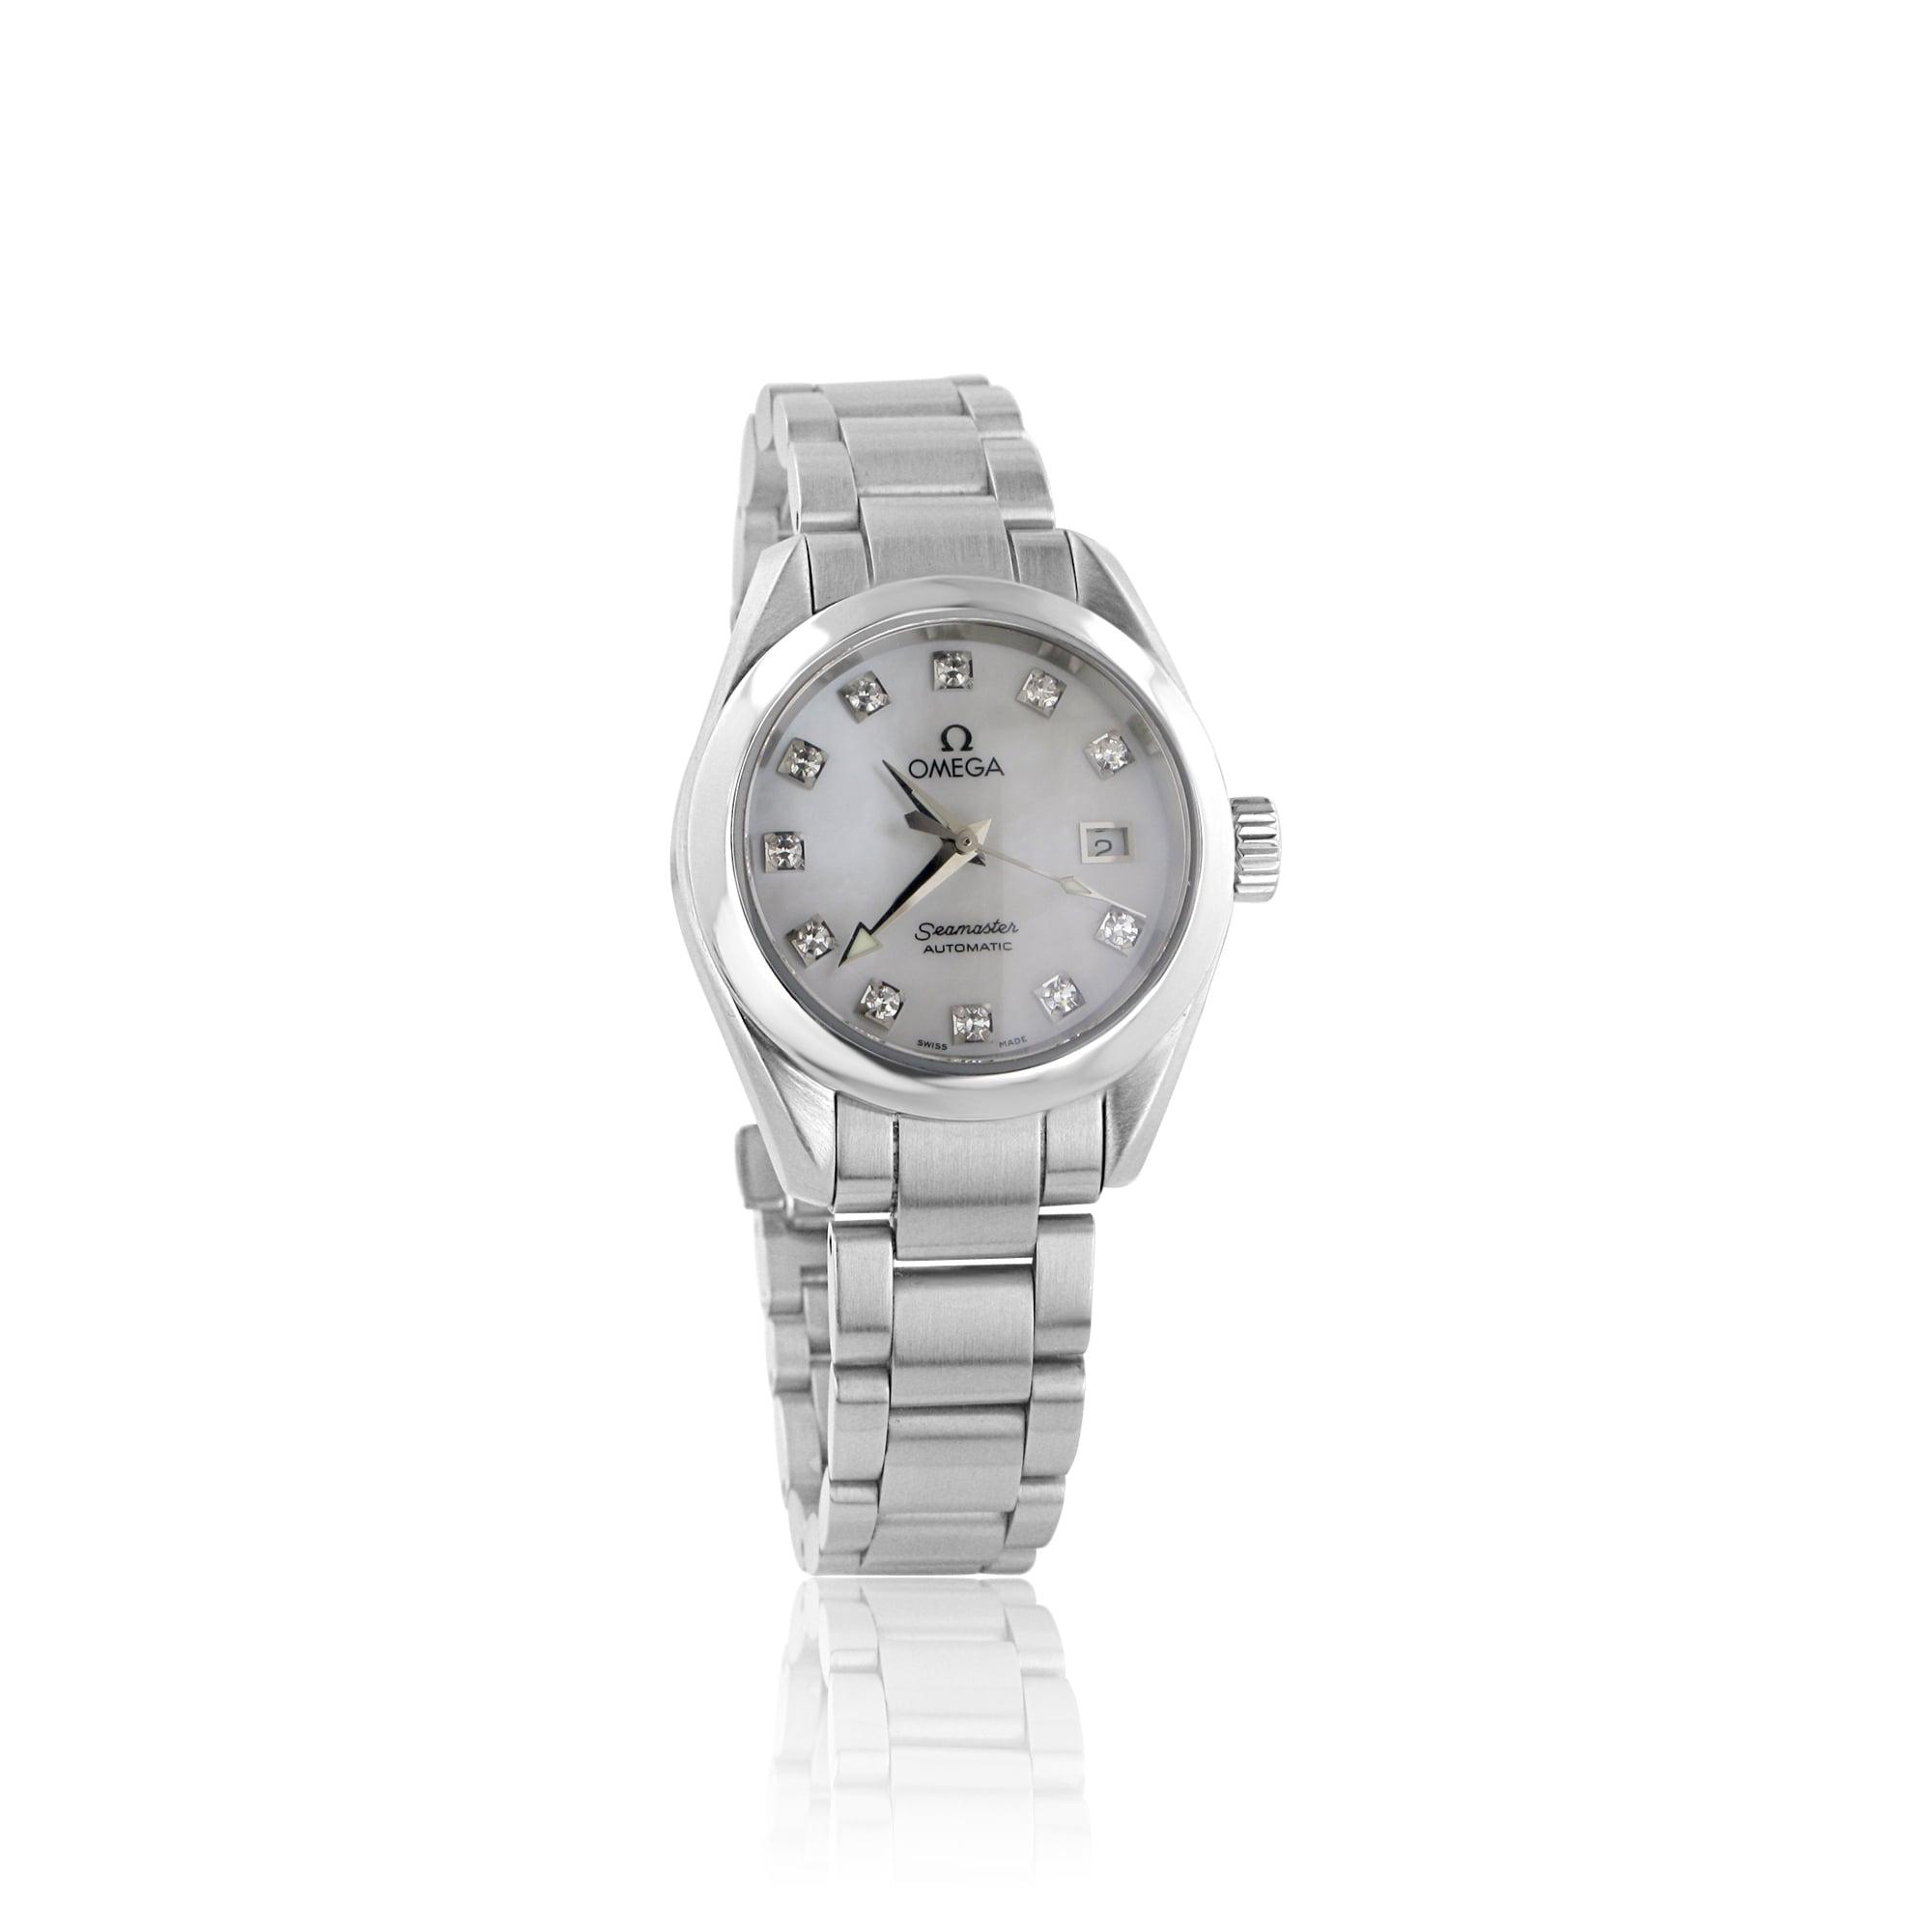 Pre-owned Womens Omega Seamaster Aqua Terra Diamond Dial Watch 3f783dbfec